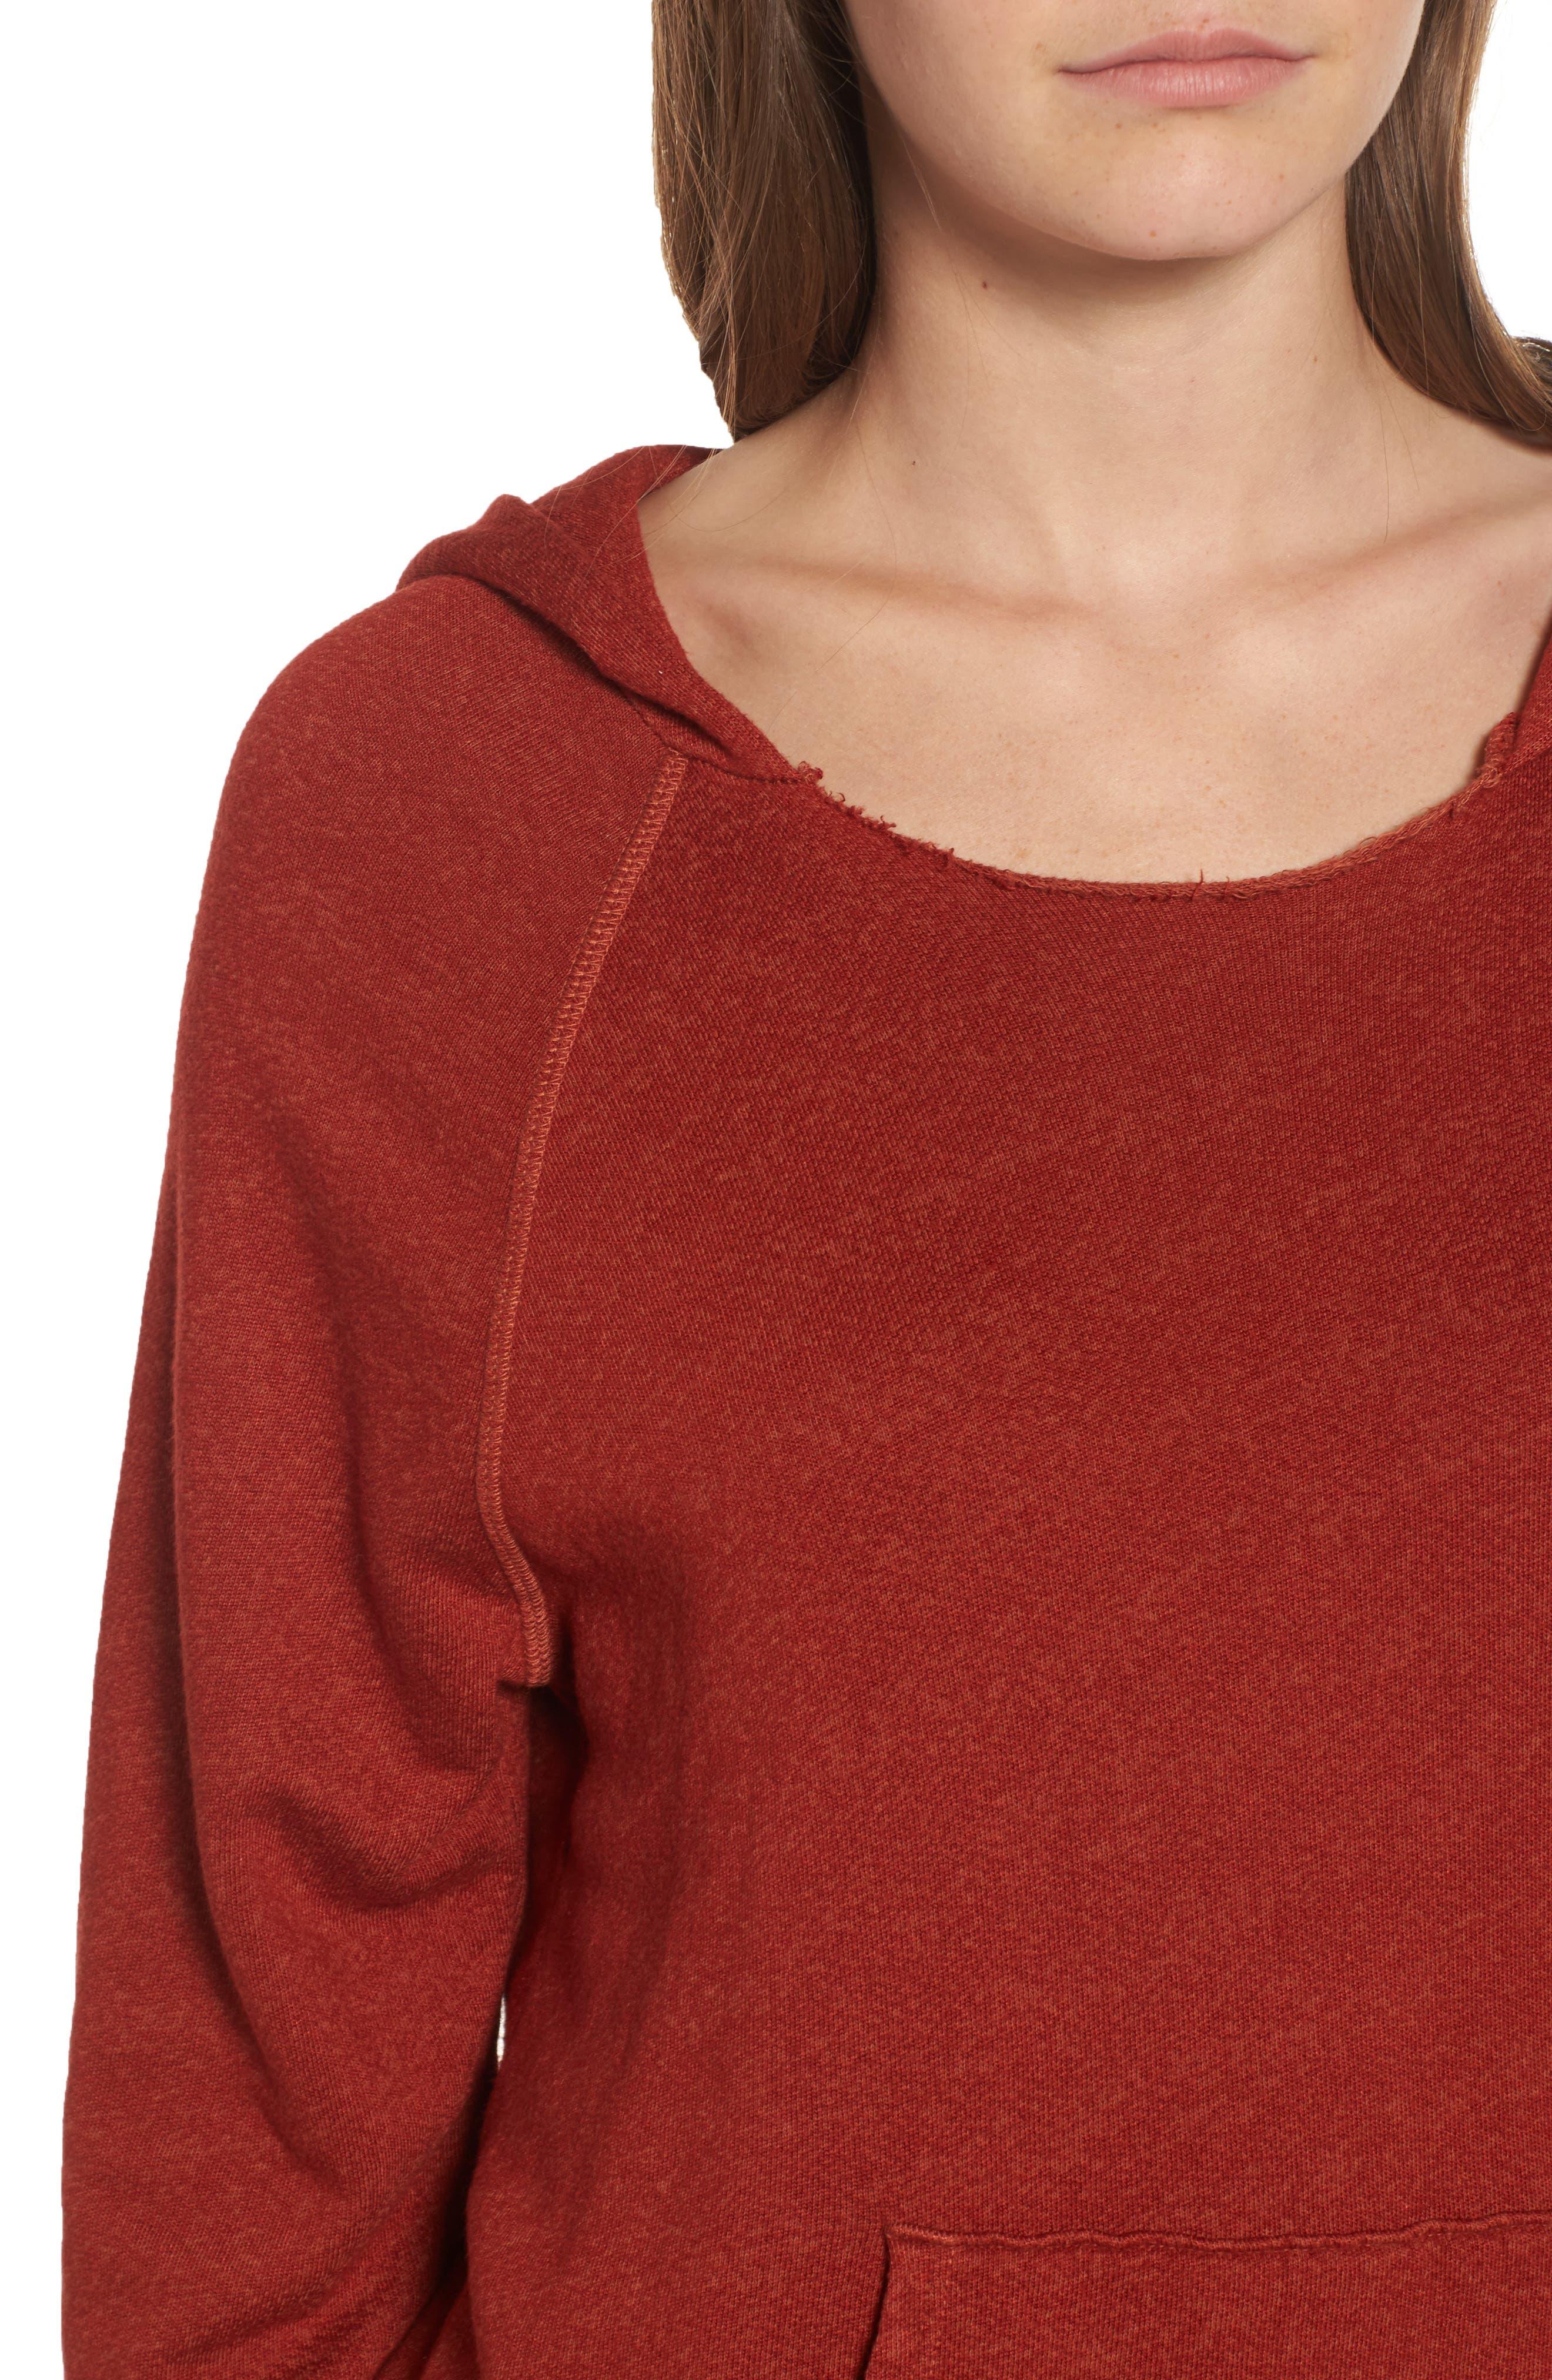 Penny Hooded Sweatshirt,                             Alternate thumbnail 4, color,                             639